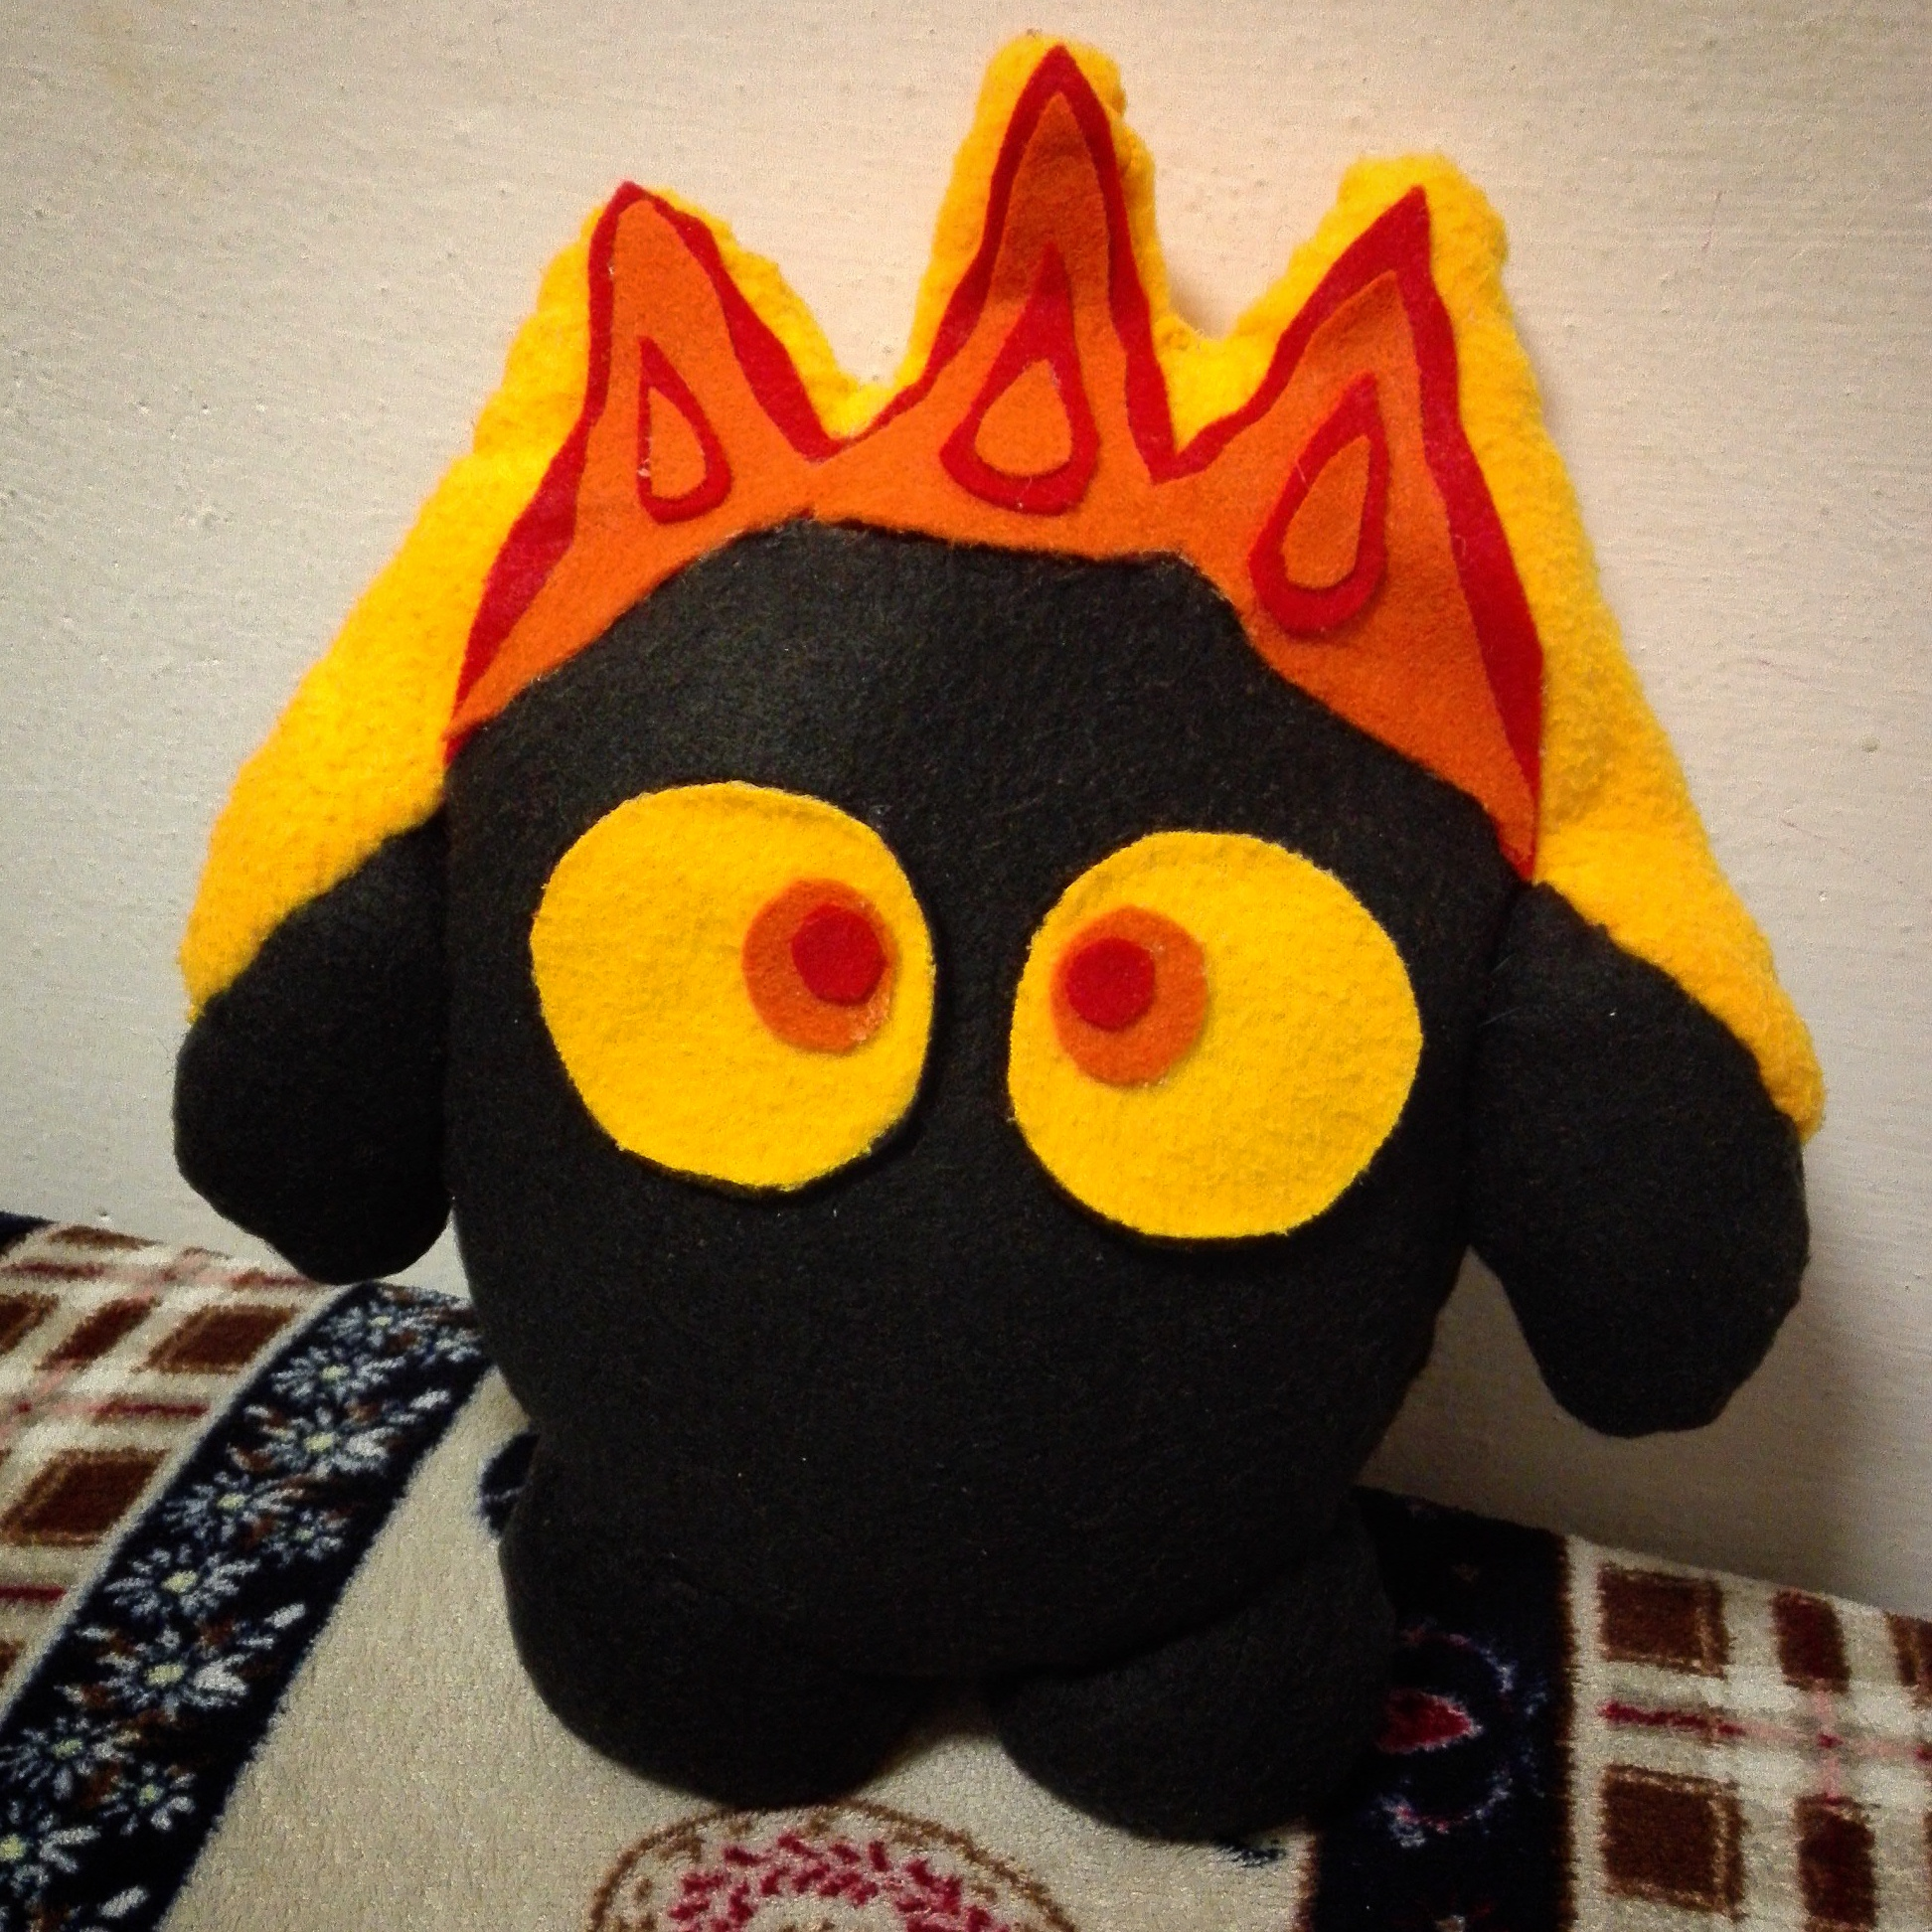 Fire Spirit plushie re >3 | Clash Royale Wiki | FANDOM